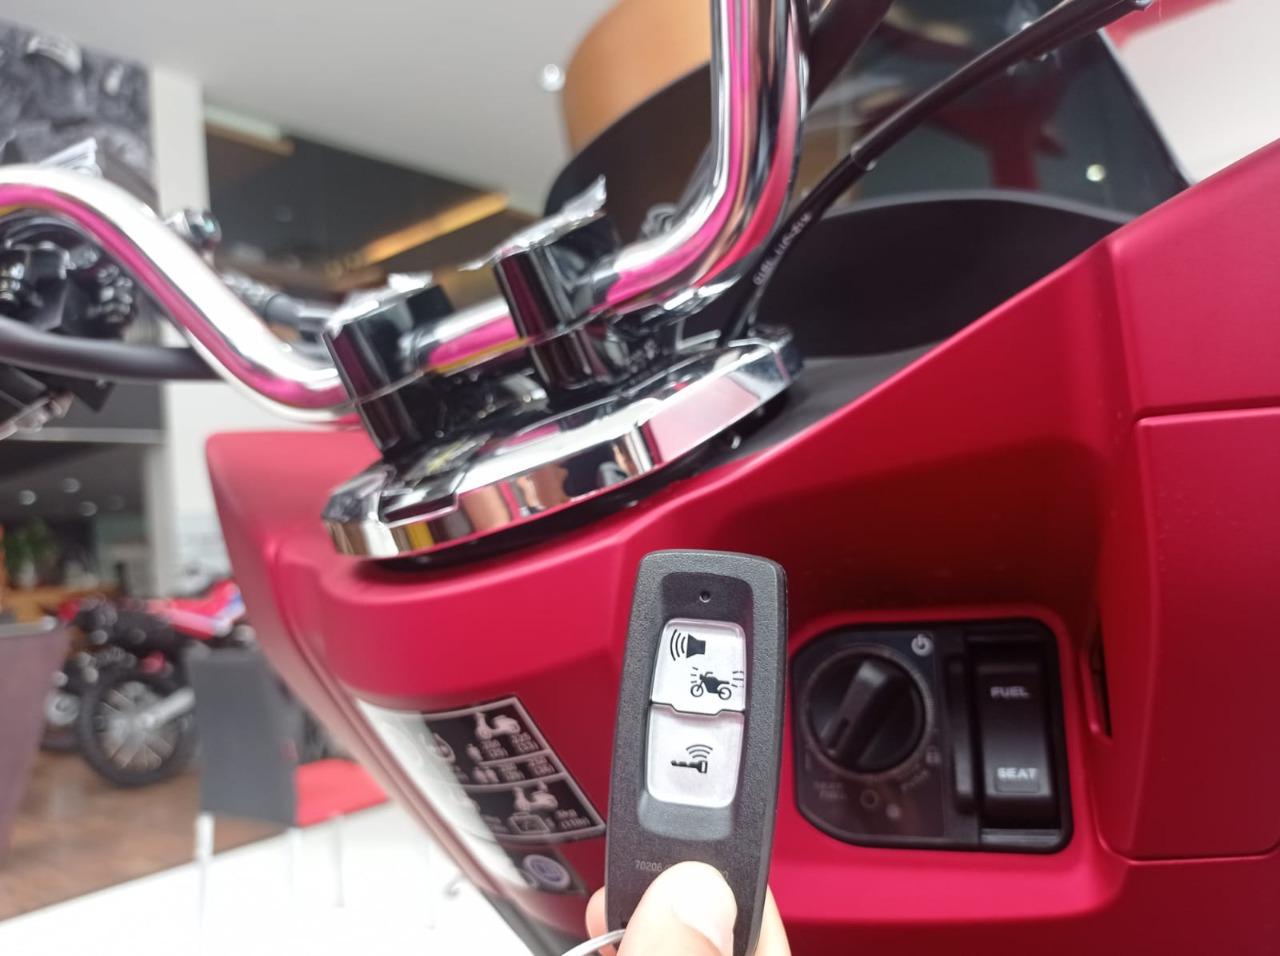 Sepeda Motor Honda sudah banyak menggunakan Honda Smart Key Sistem